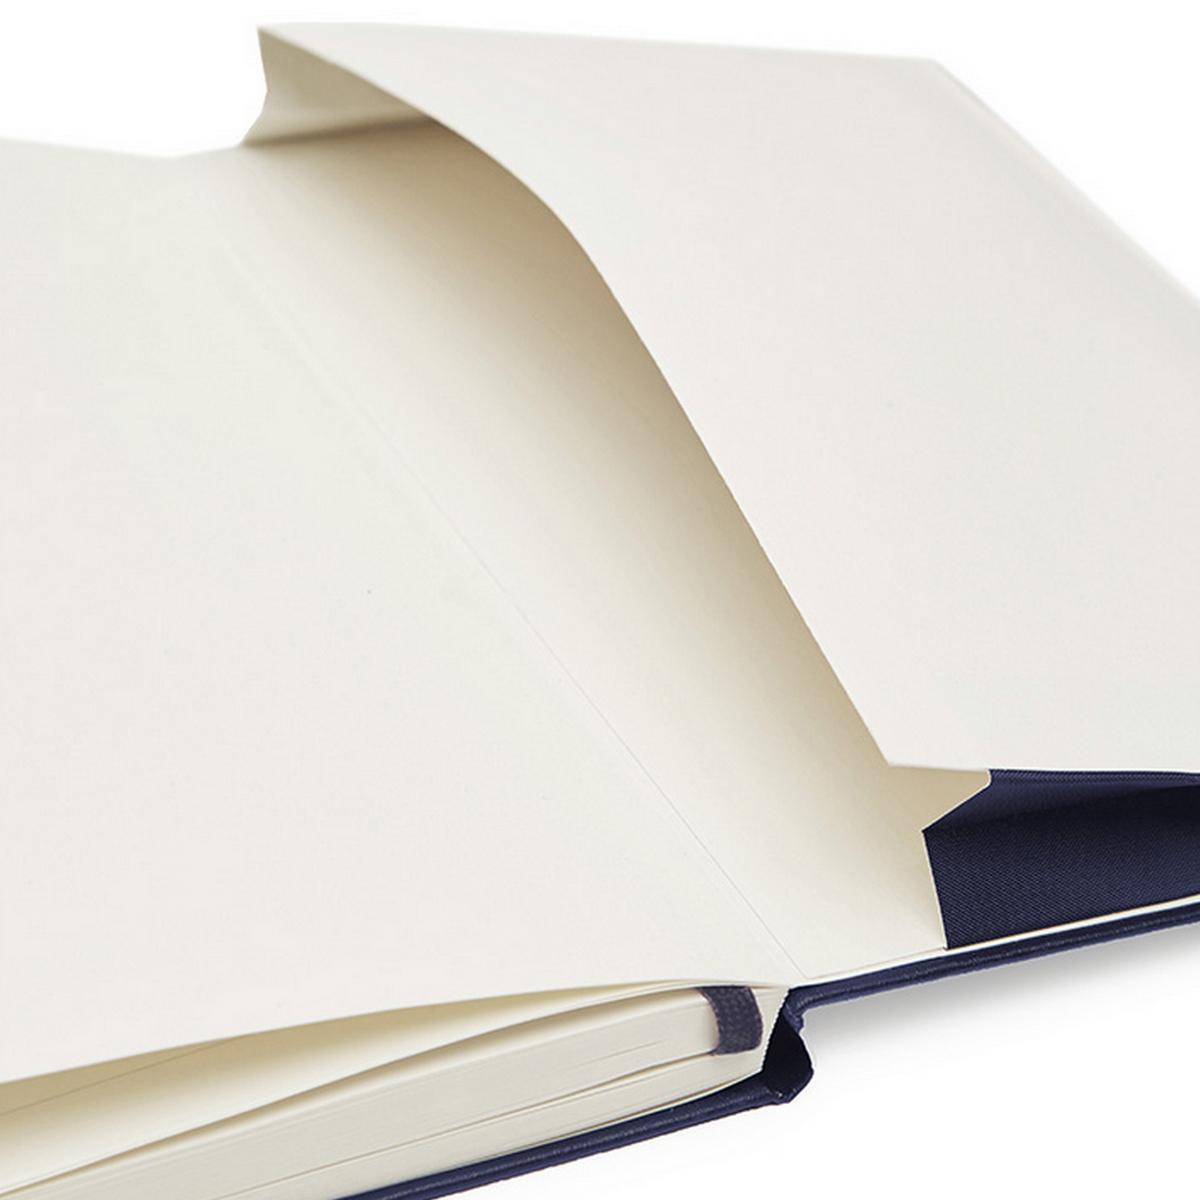 Moleskine Cuaderno Tapa Dura 21x12,7